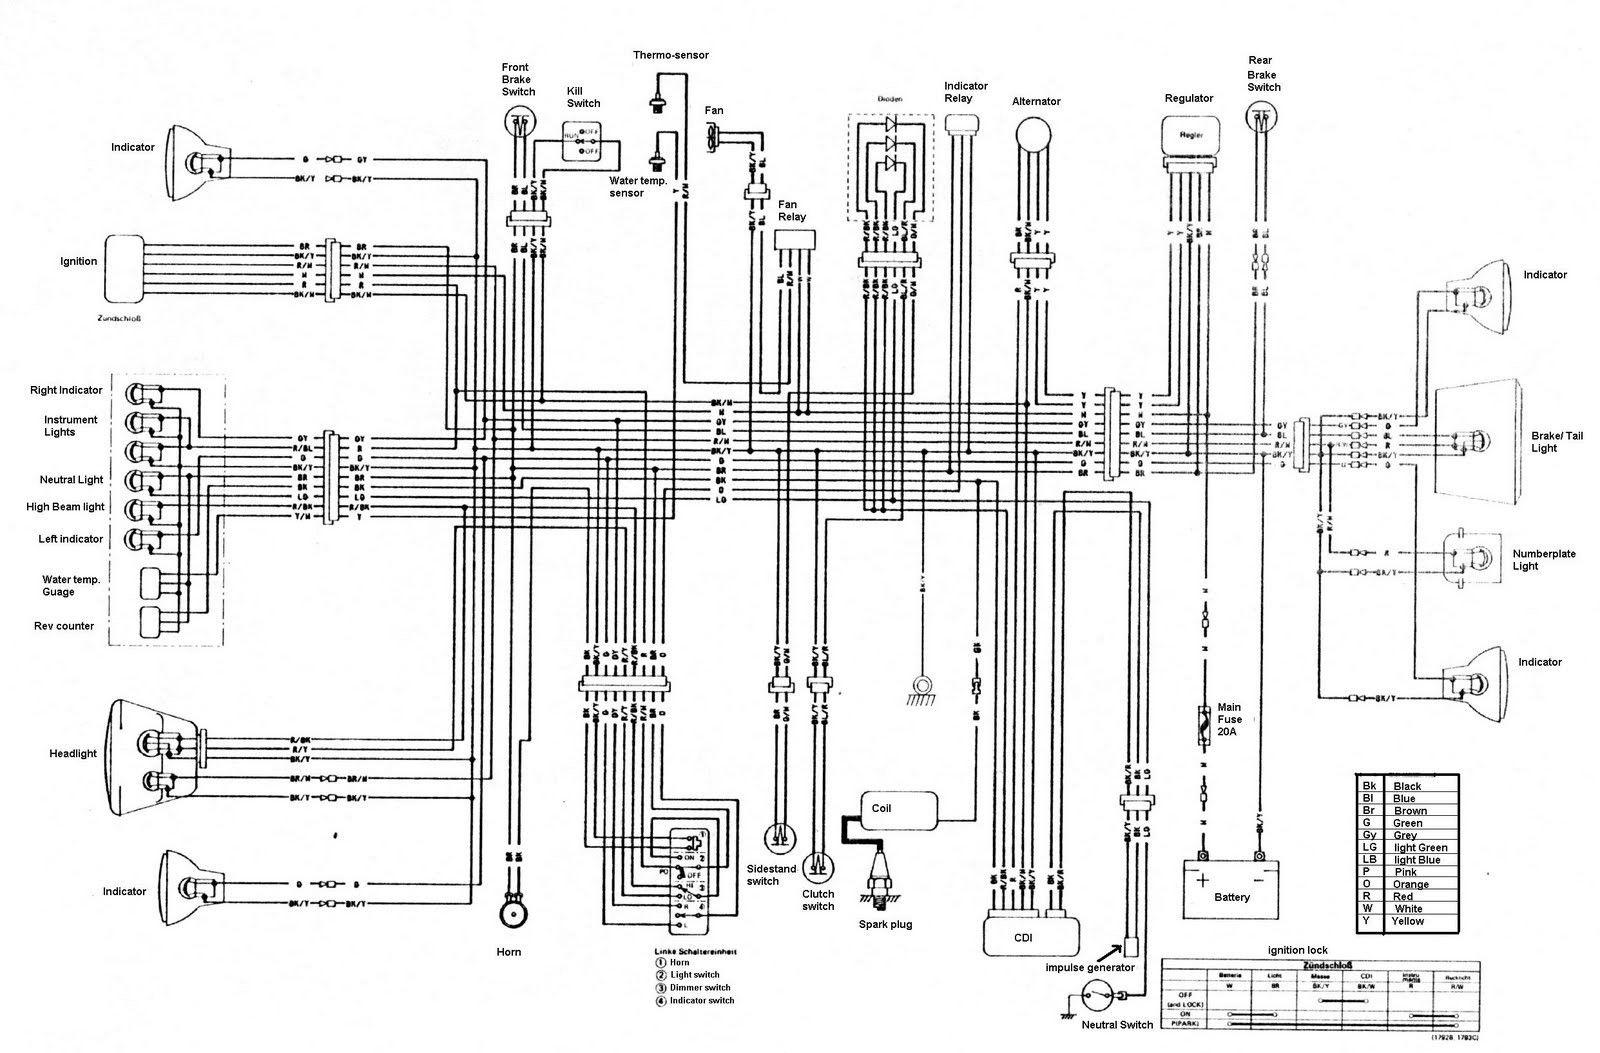 08 kawasaki 650r wiring harness manual e books 06 kawasaki 650r kawasaki klx wiring harness wiring diagram descriptionkawasaki klx wiring harness data wiring diagram today kawasaki dual